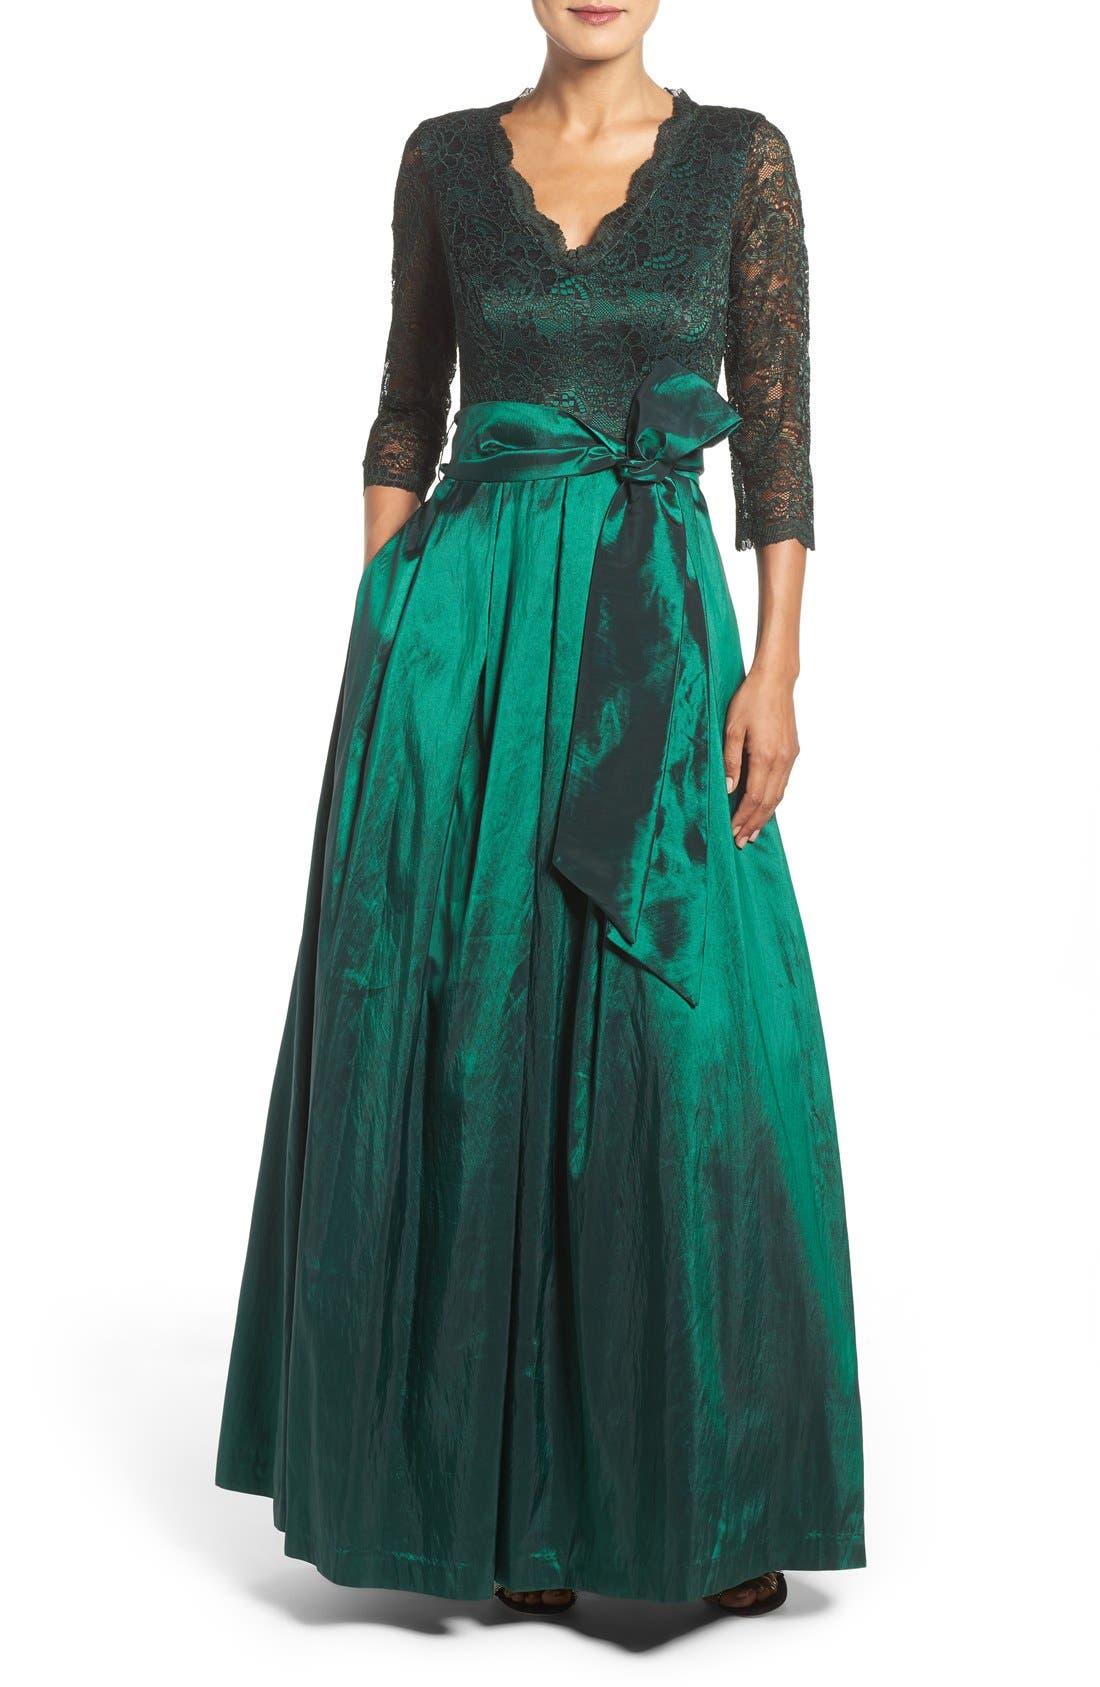 Alternate Image 1 Selected - Eliza J Lace & Taffeta Gown